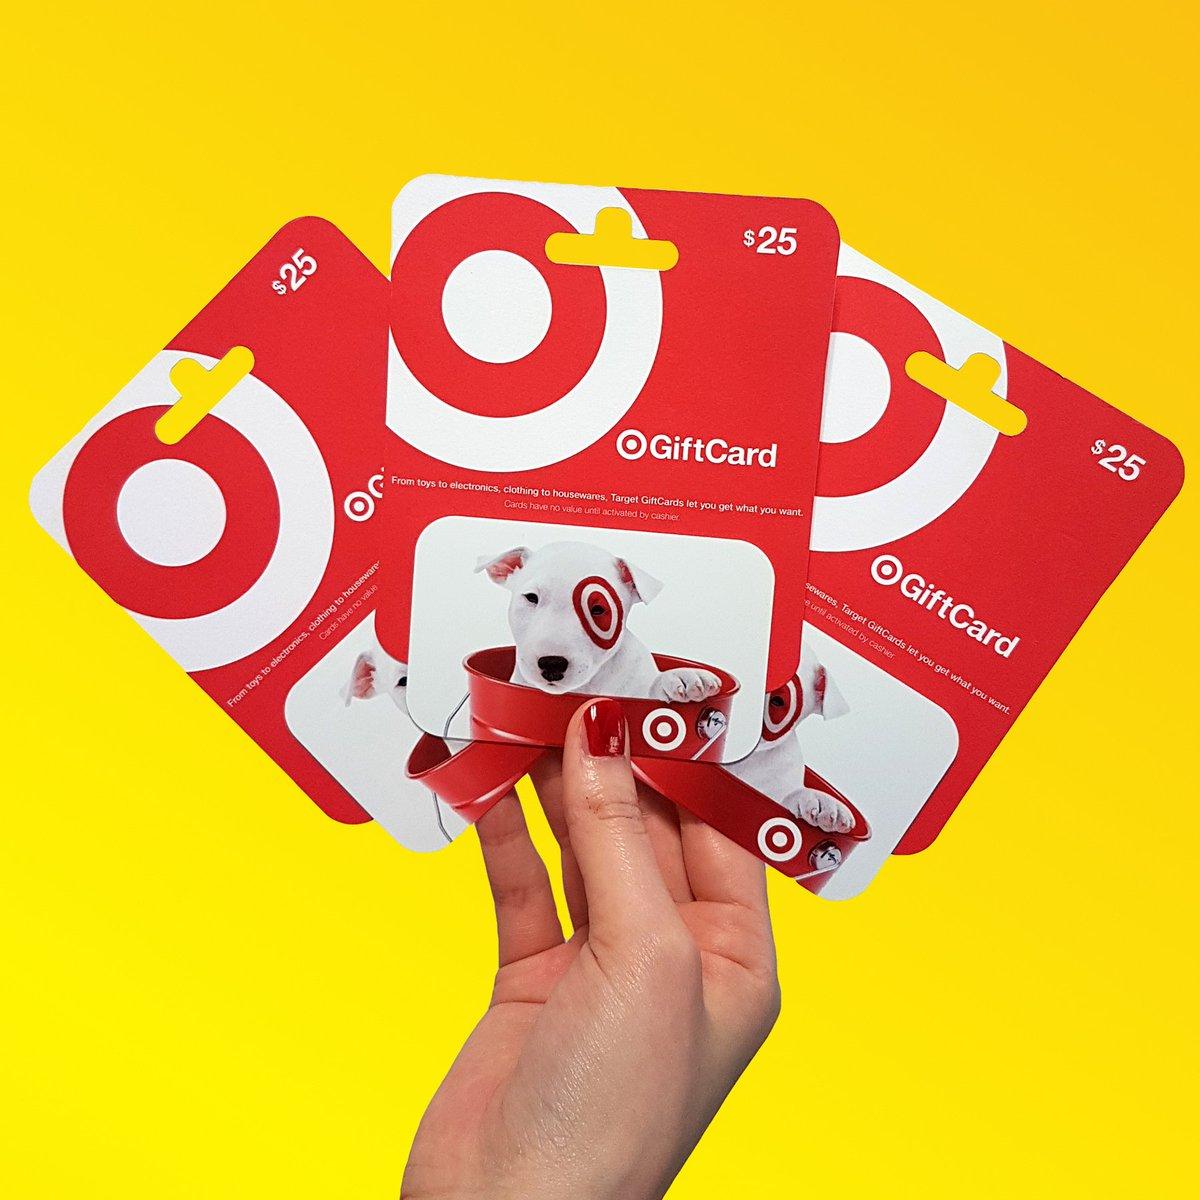 Lucky Day Luckydayapp Twitter Googleplay Gift Card 100k Pic S8lu7u2rfv